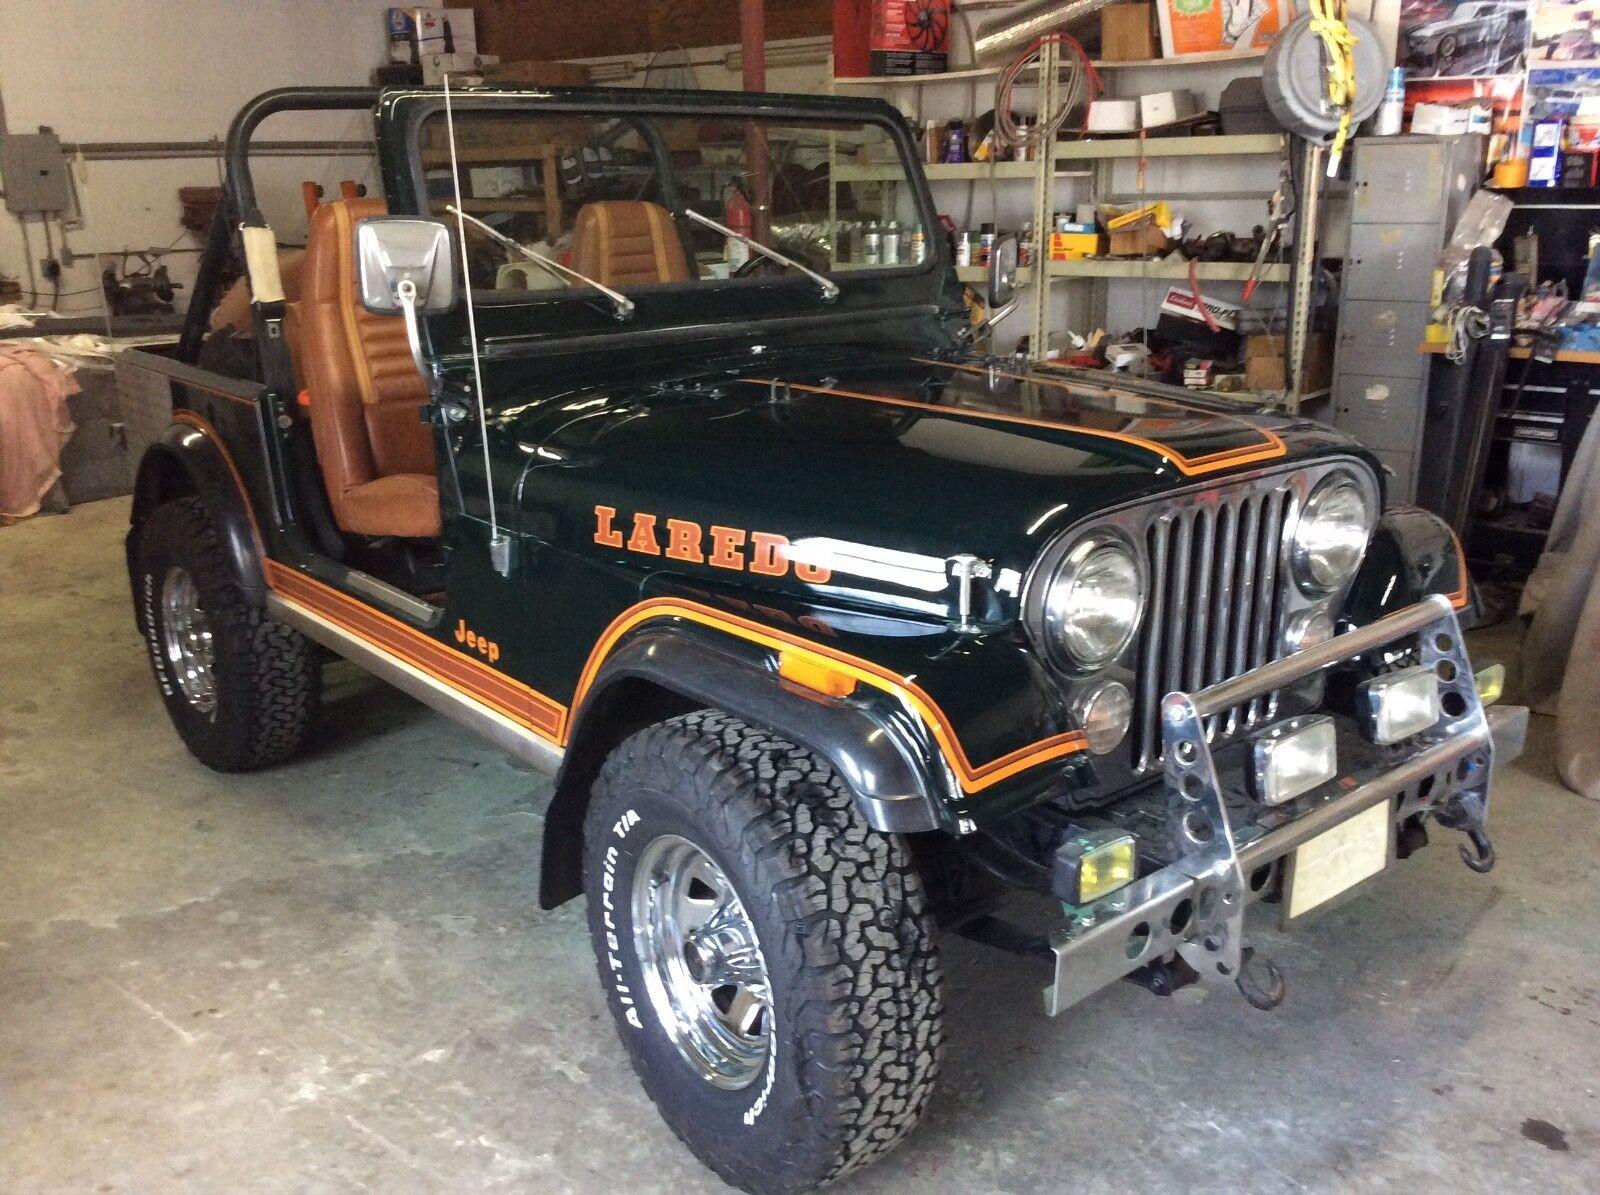 1984 Jeep CJ  1984 Jeep CJ Wrangler